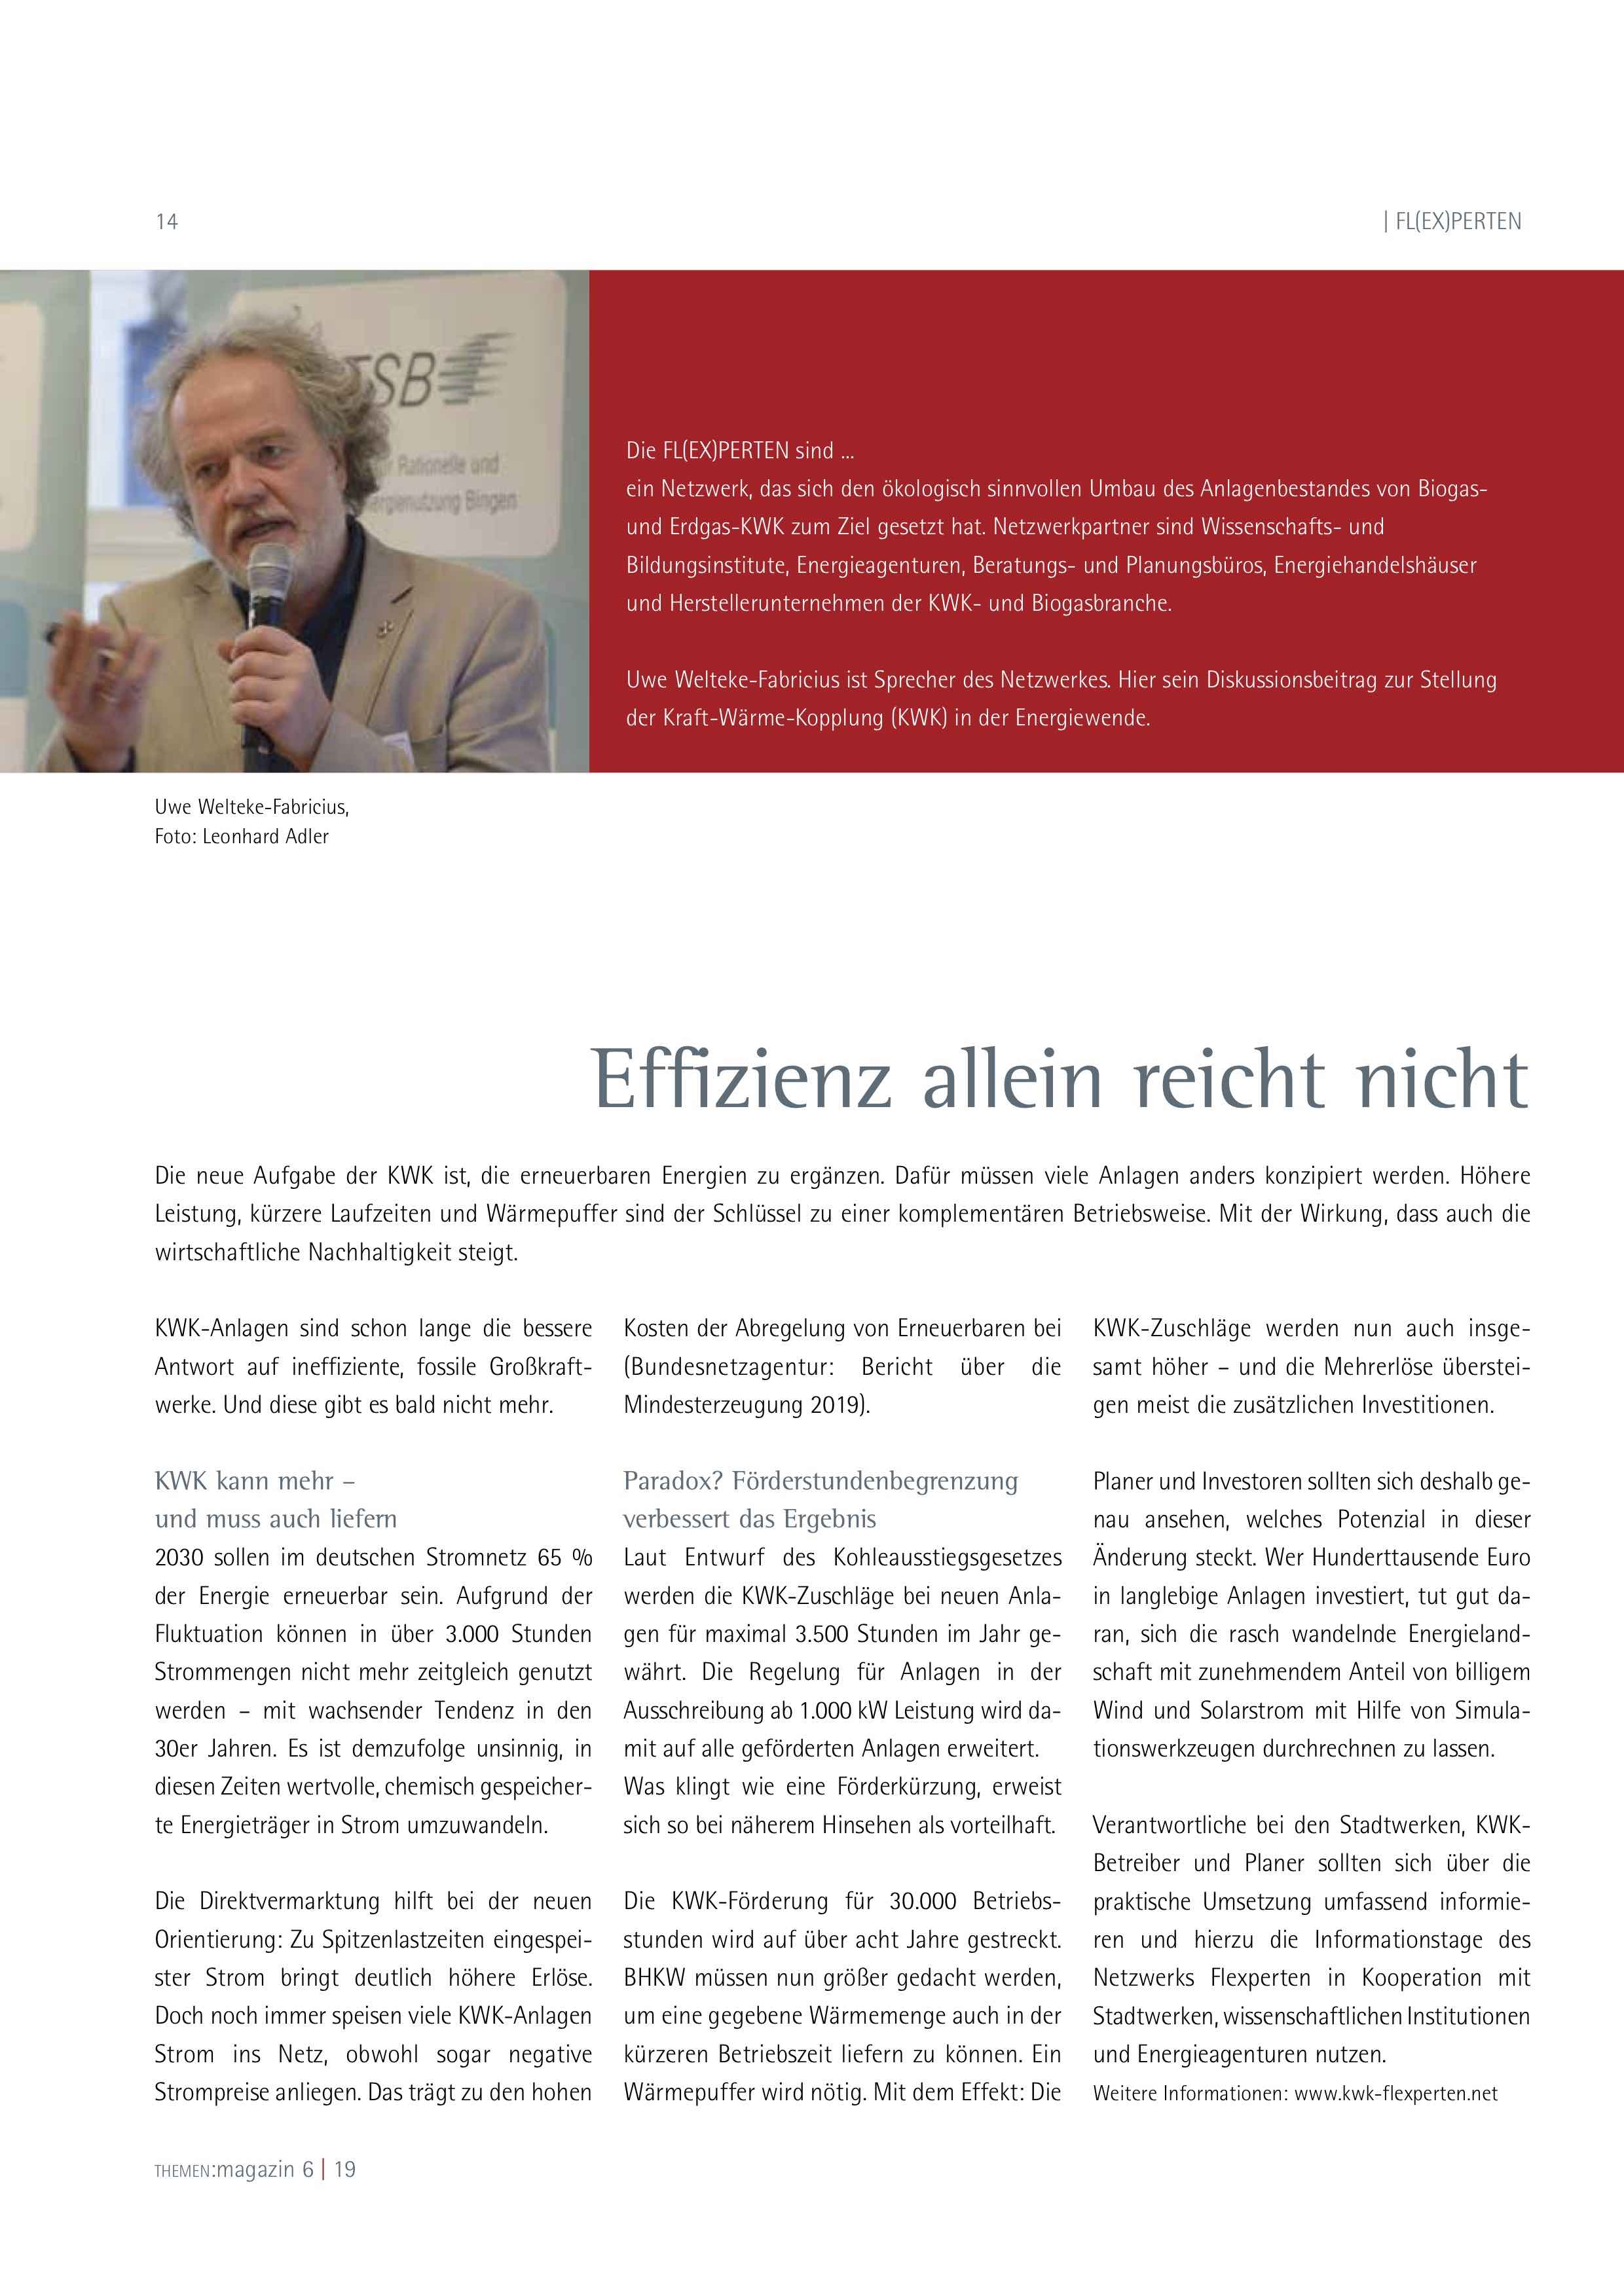 FL(EX)PERTEN Uwe Welteke-Fabricius